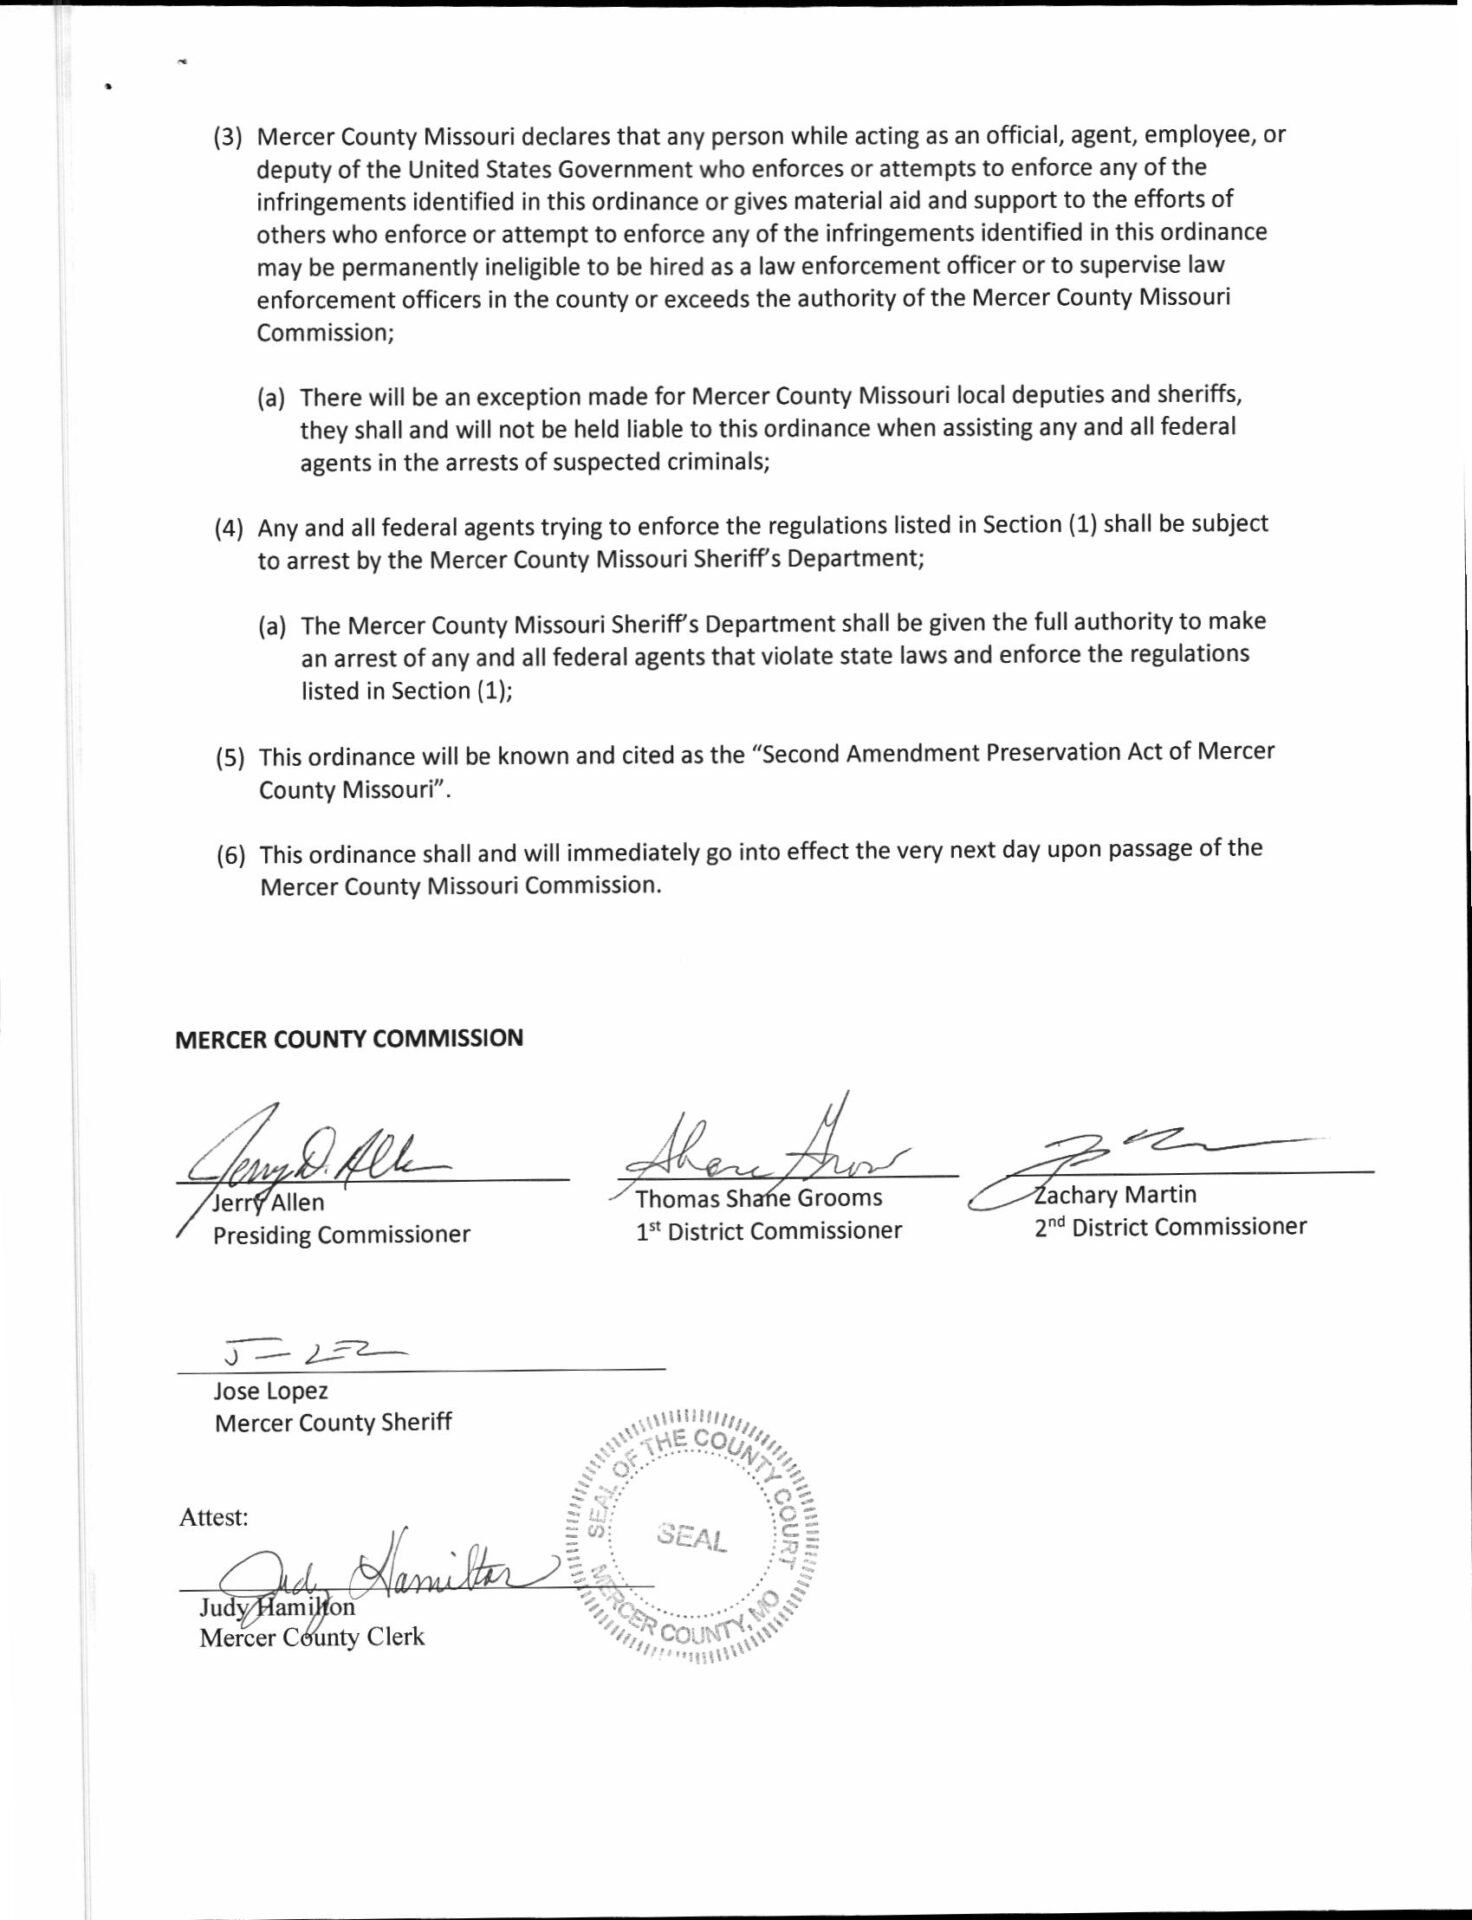 Mercer County Missouri Second Amendment Preservation Act pg2